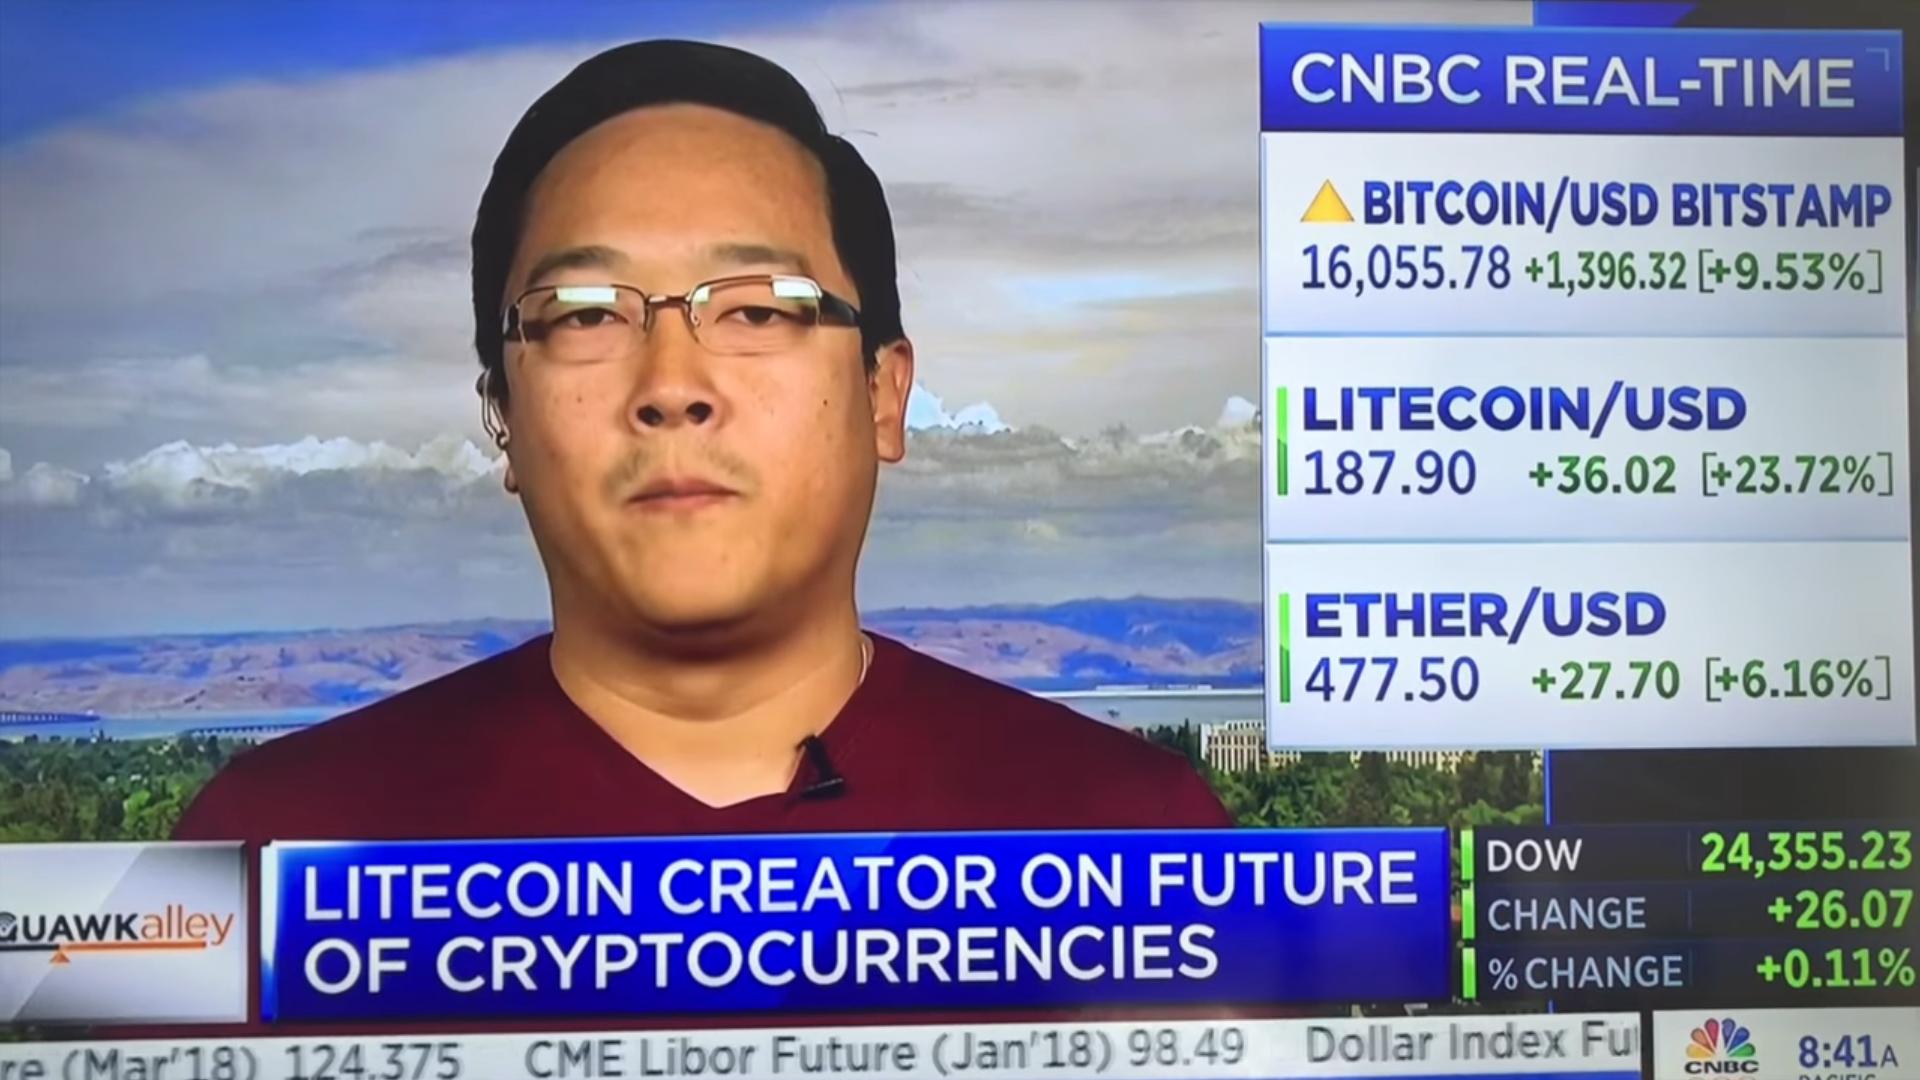 Litecoin creator